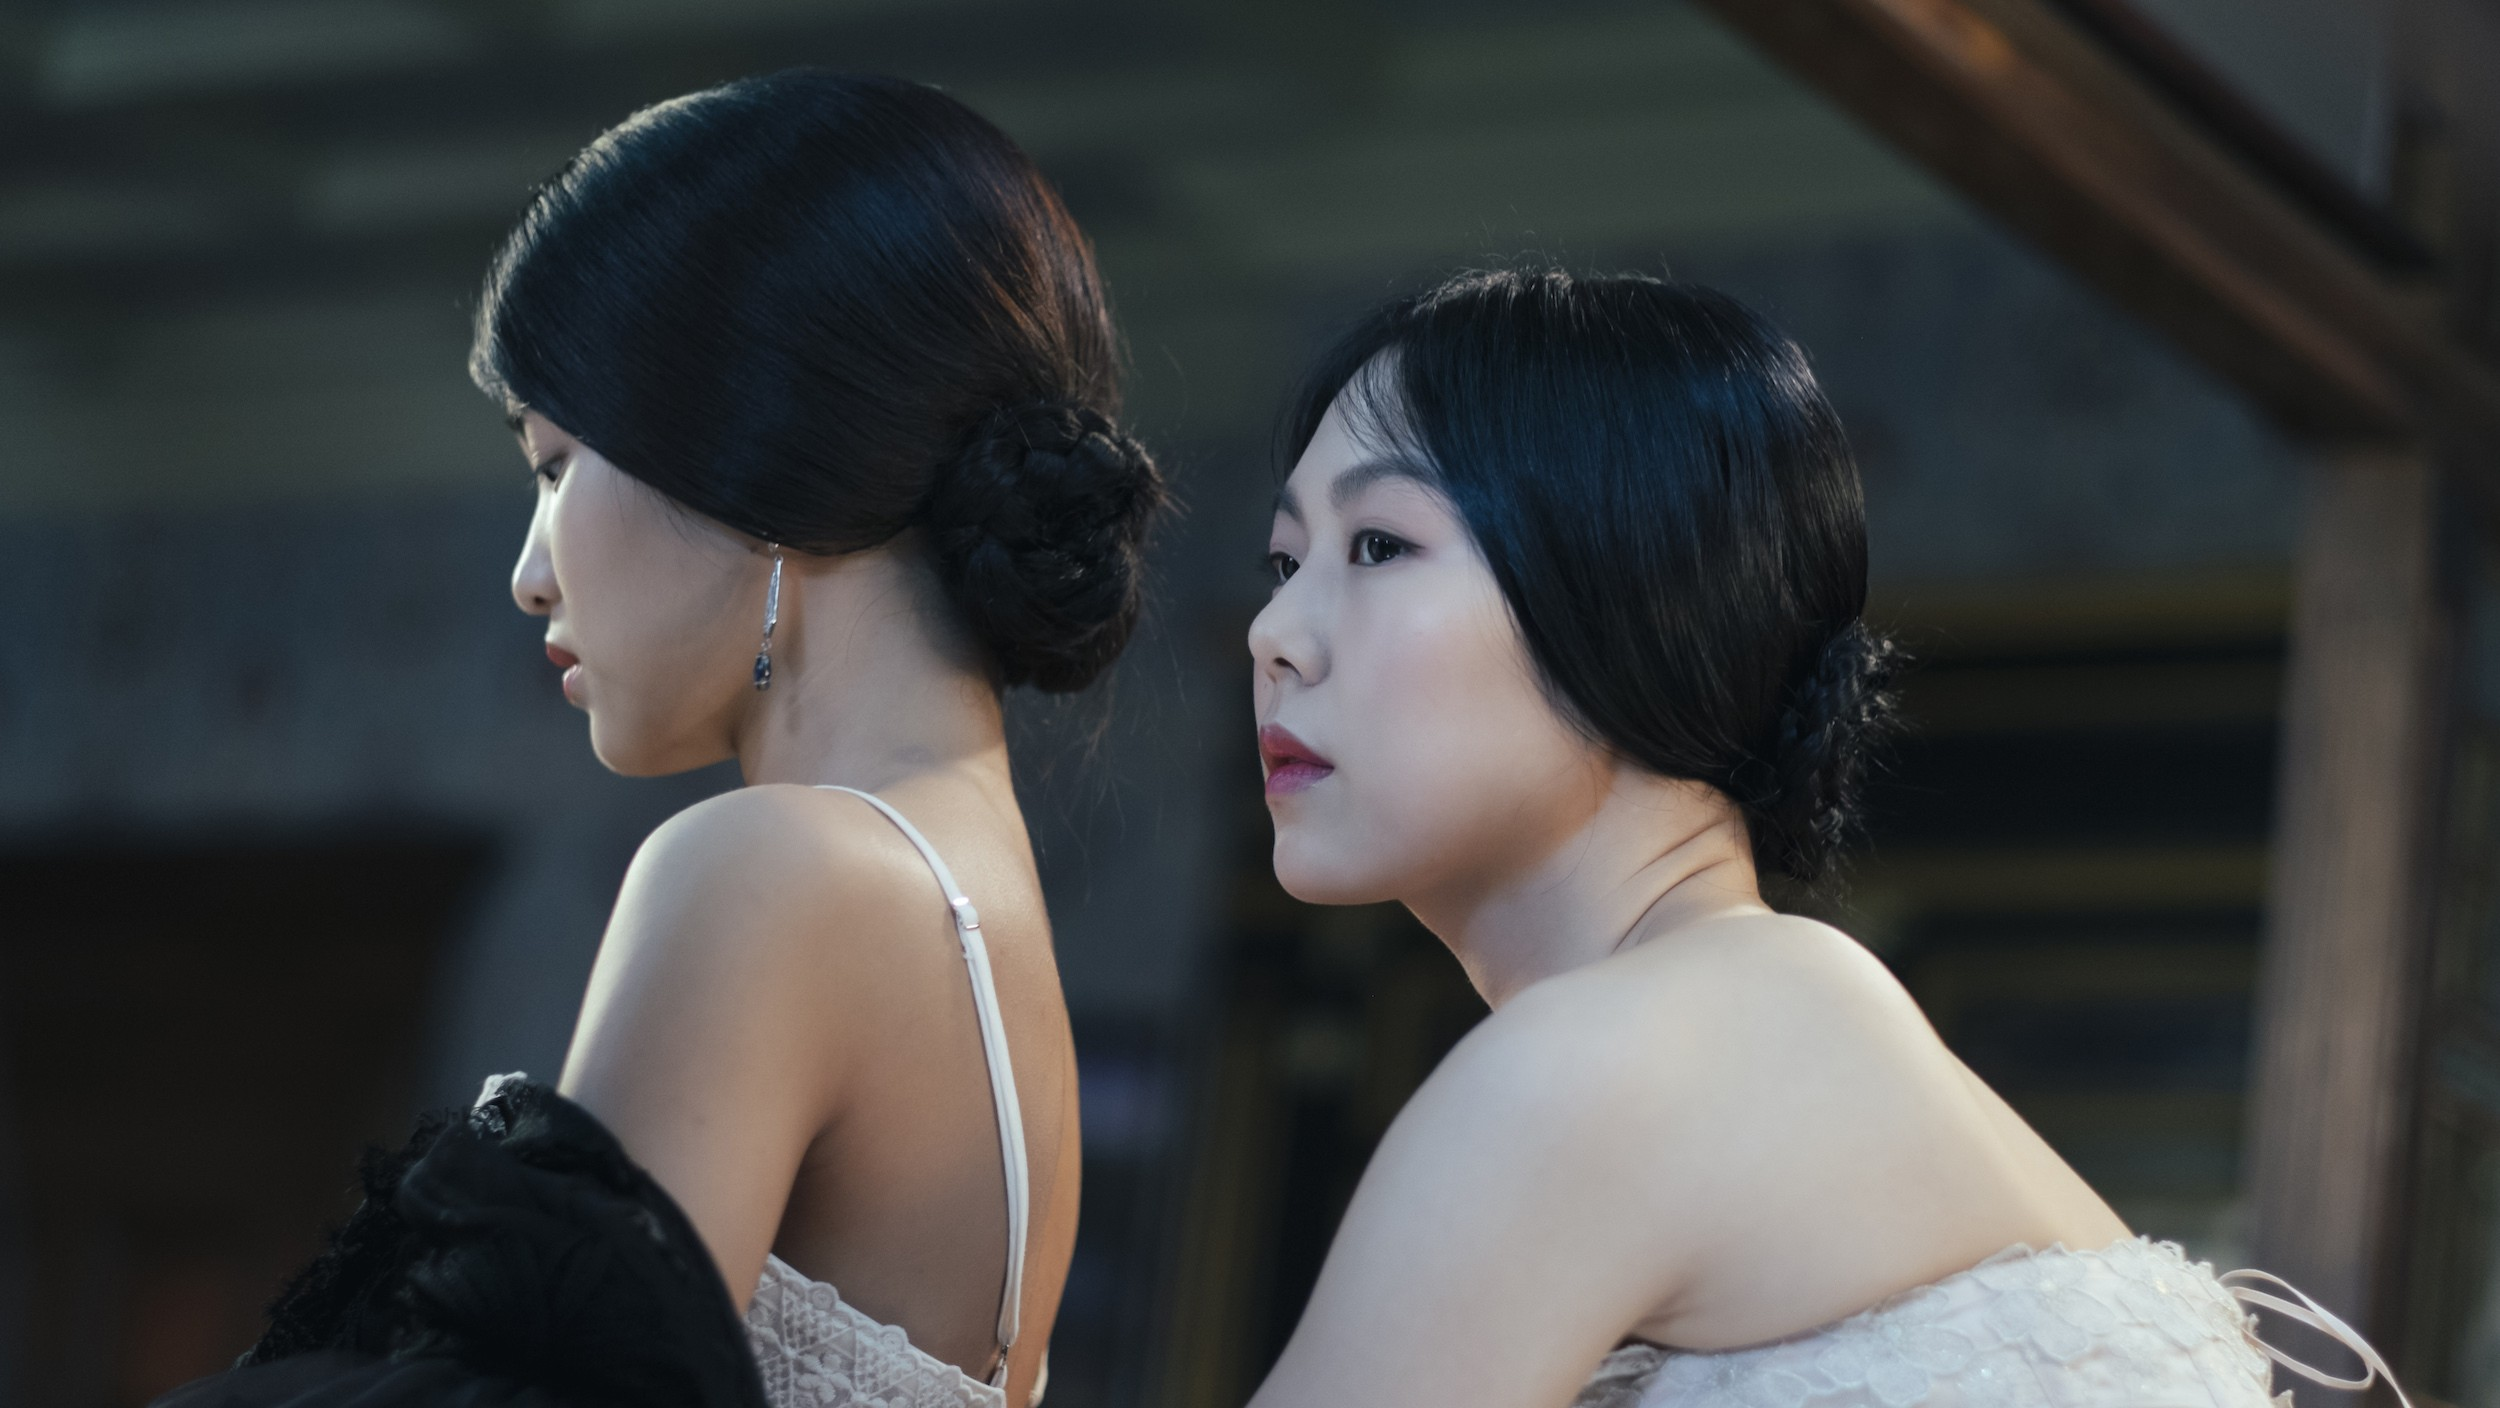 park chan wook on the subversive sensuality of his korean lesbian